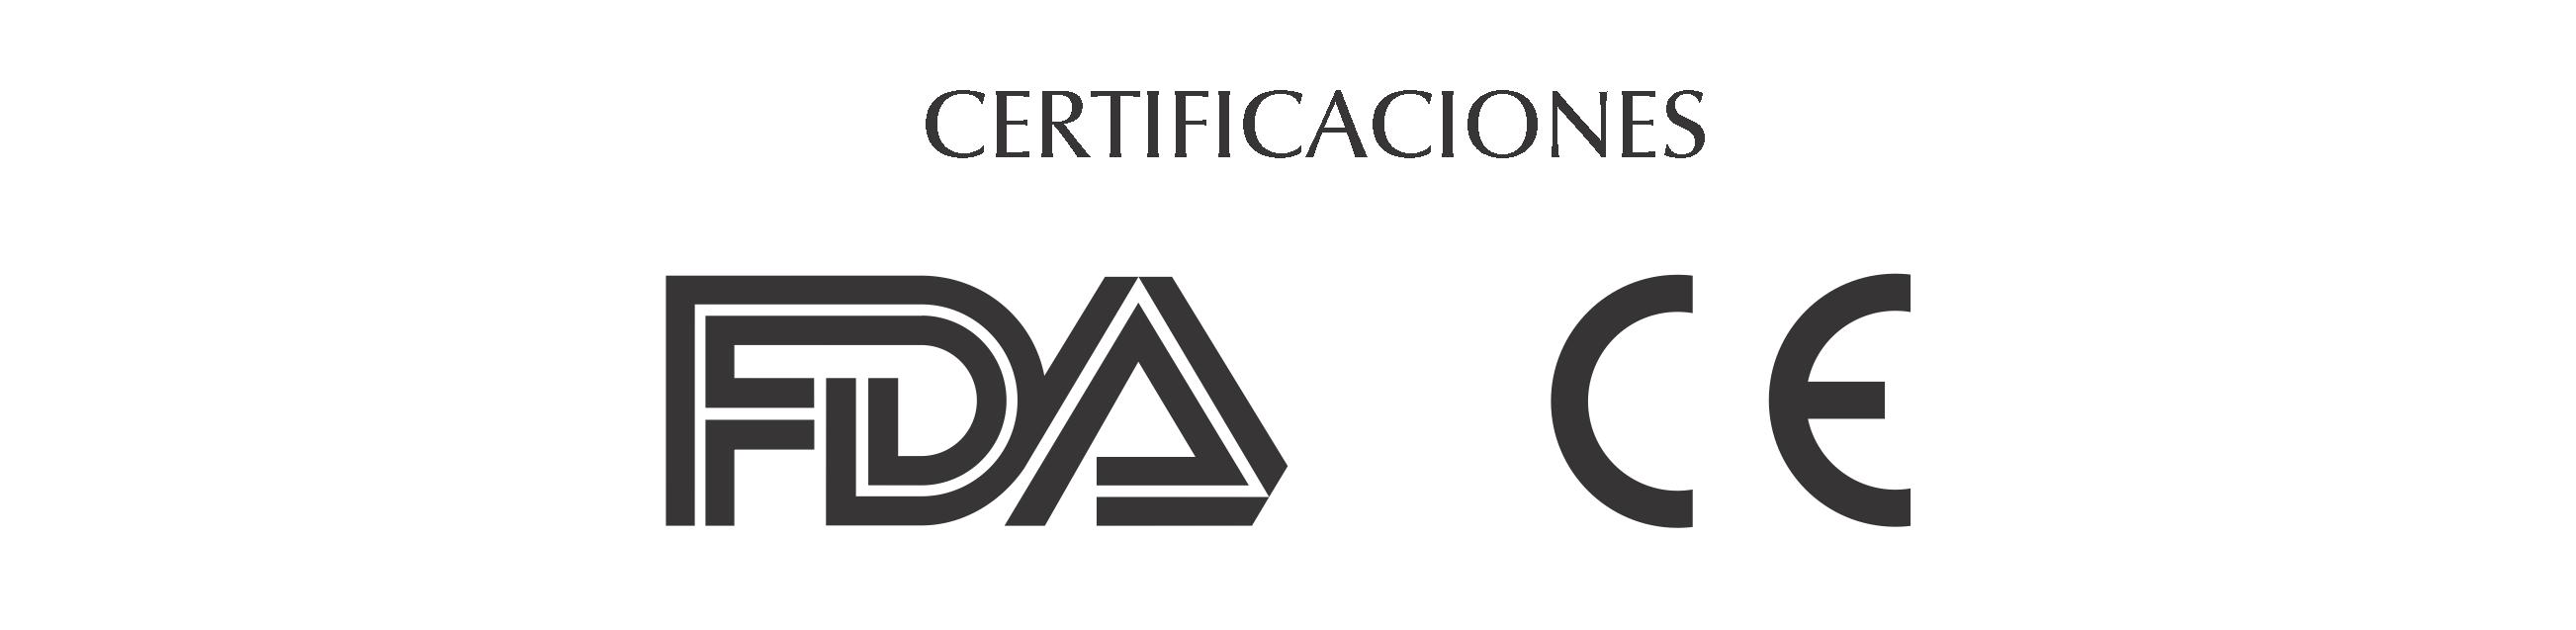 https://microdont.com.br/wp-content/uploads/2016/07/logo_cert_port_esp.png